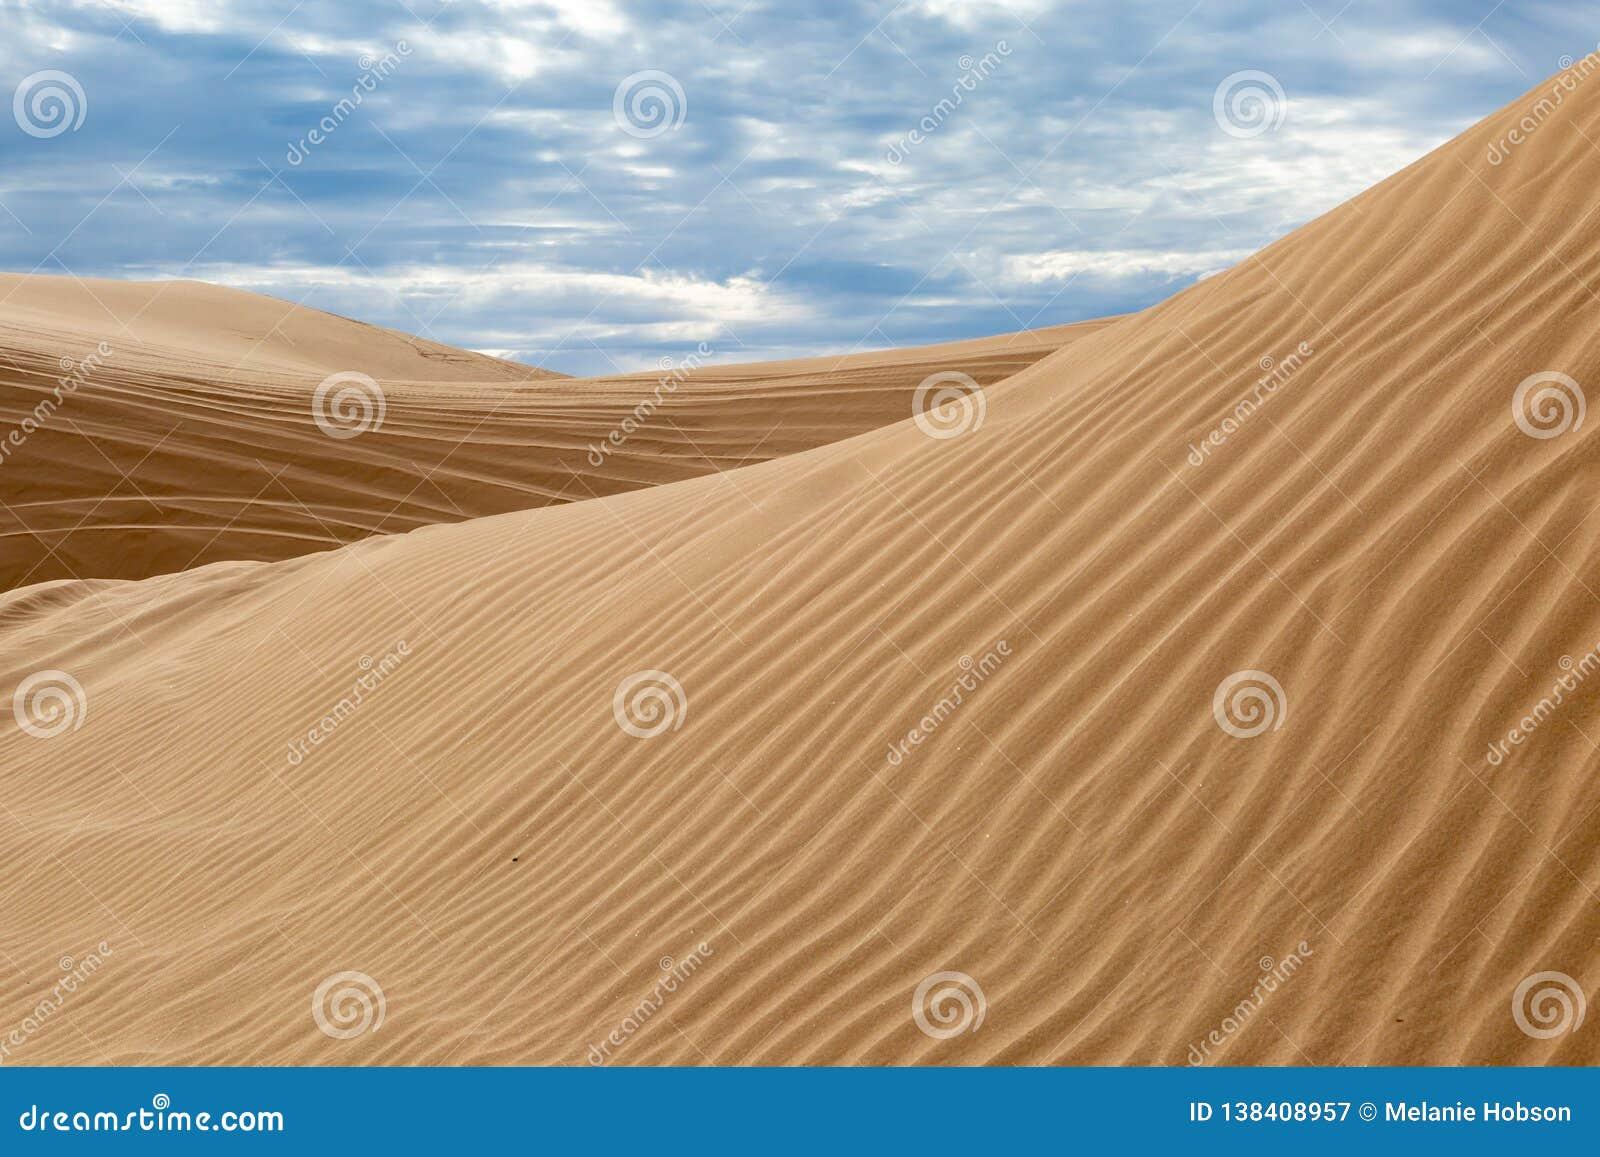 Algodones Dunes, California Stock Image   Image of sand, horizon ...